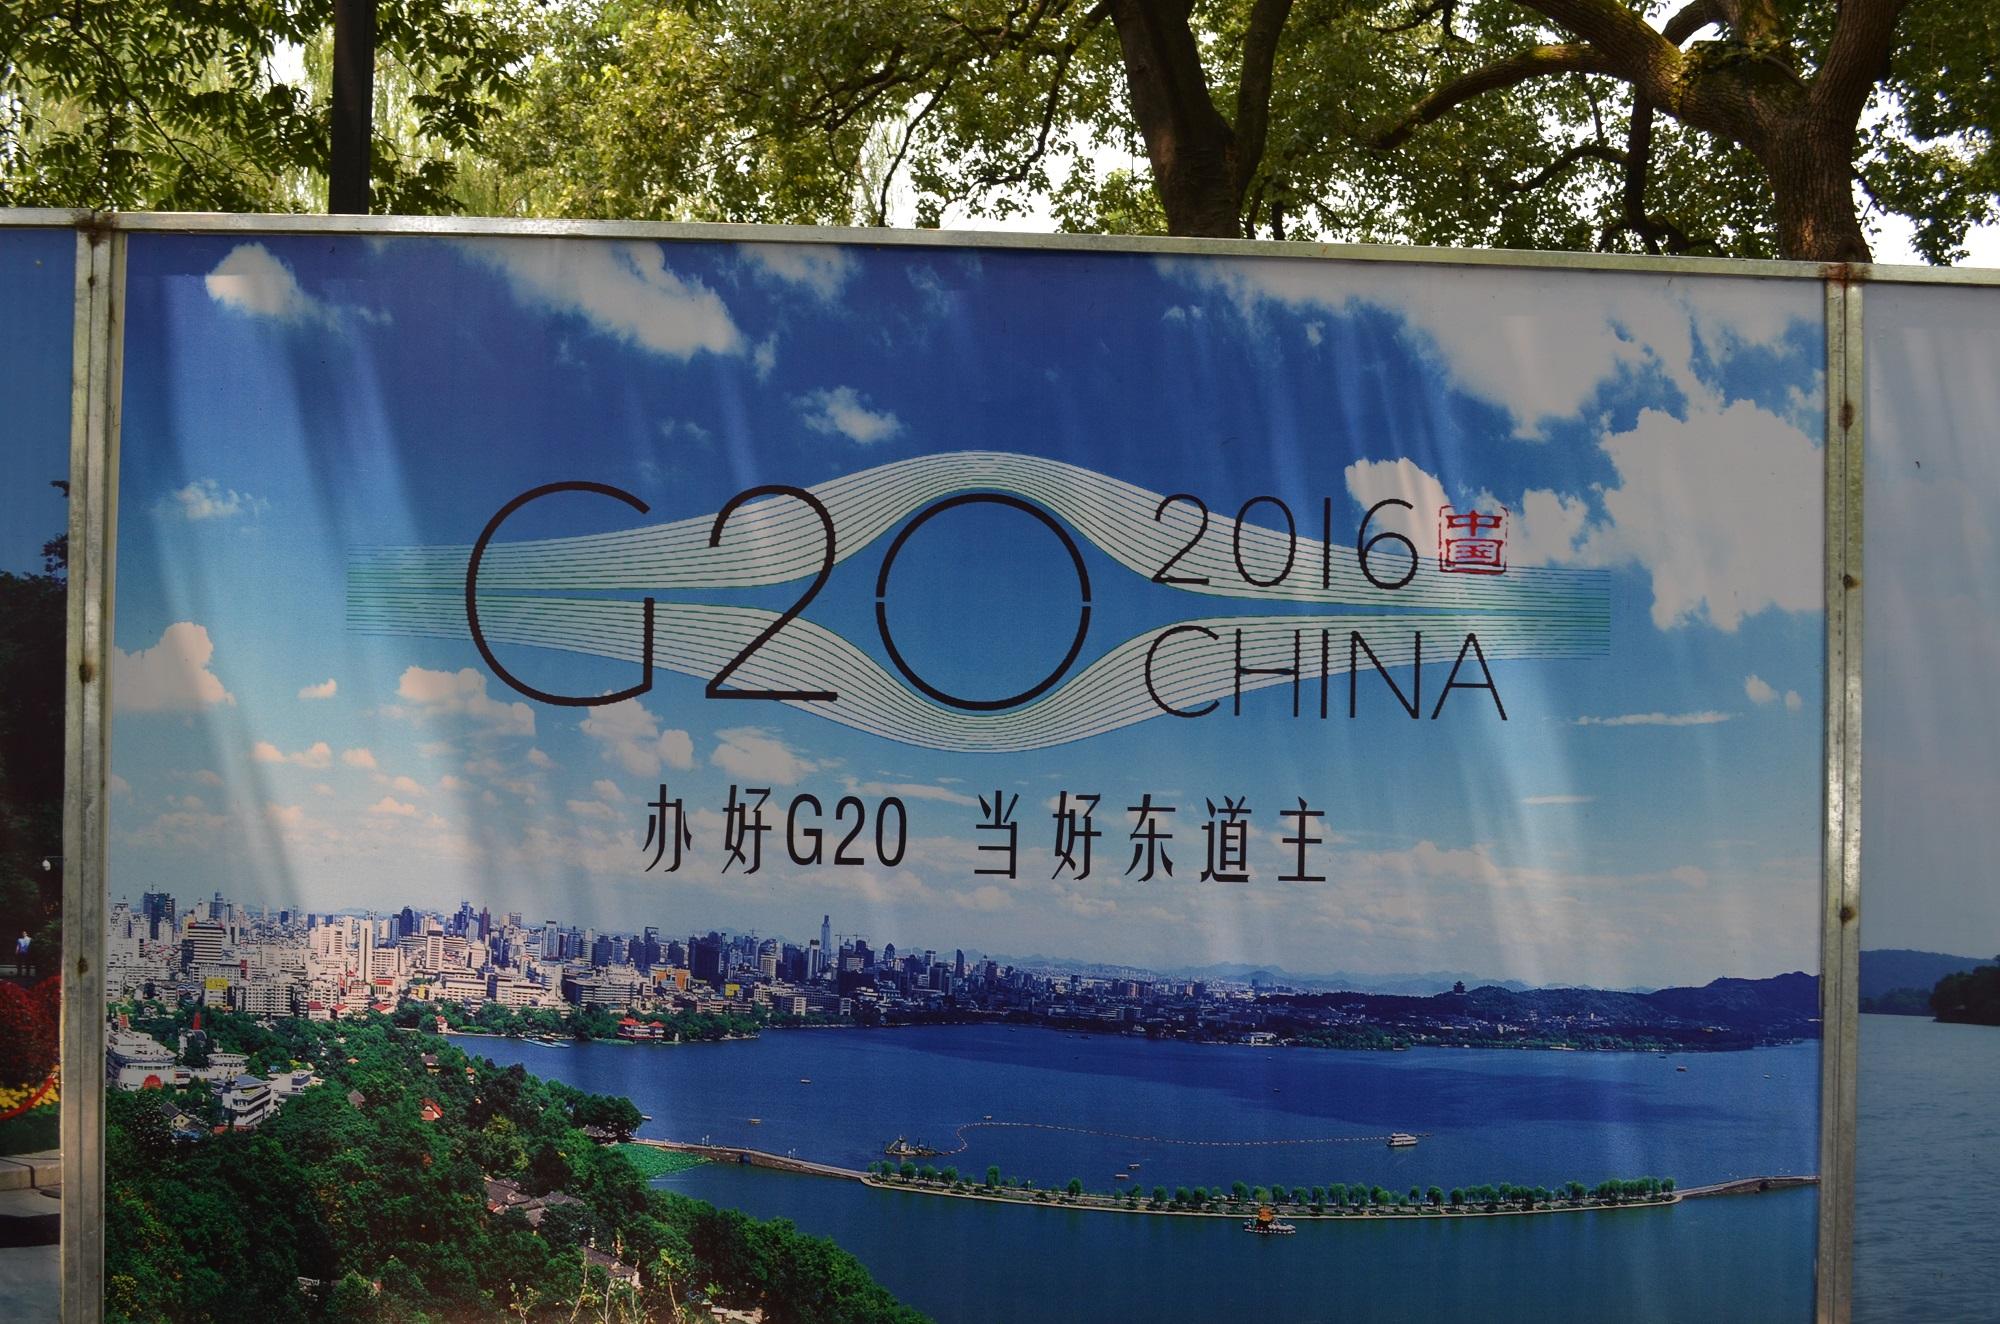 G20 Werbung an einem Bauzaun.